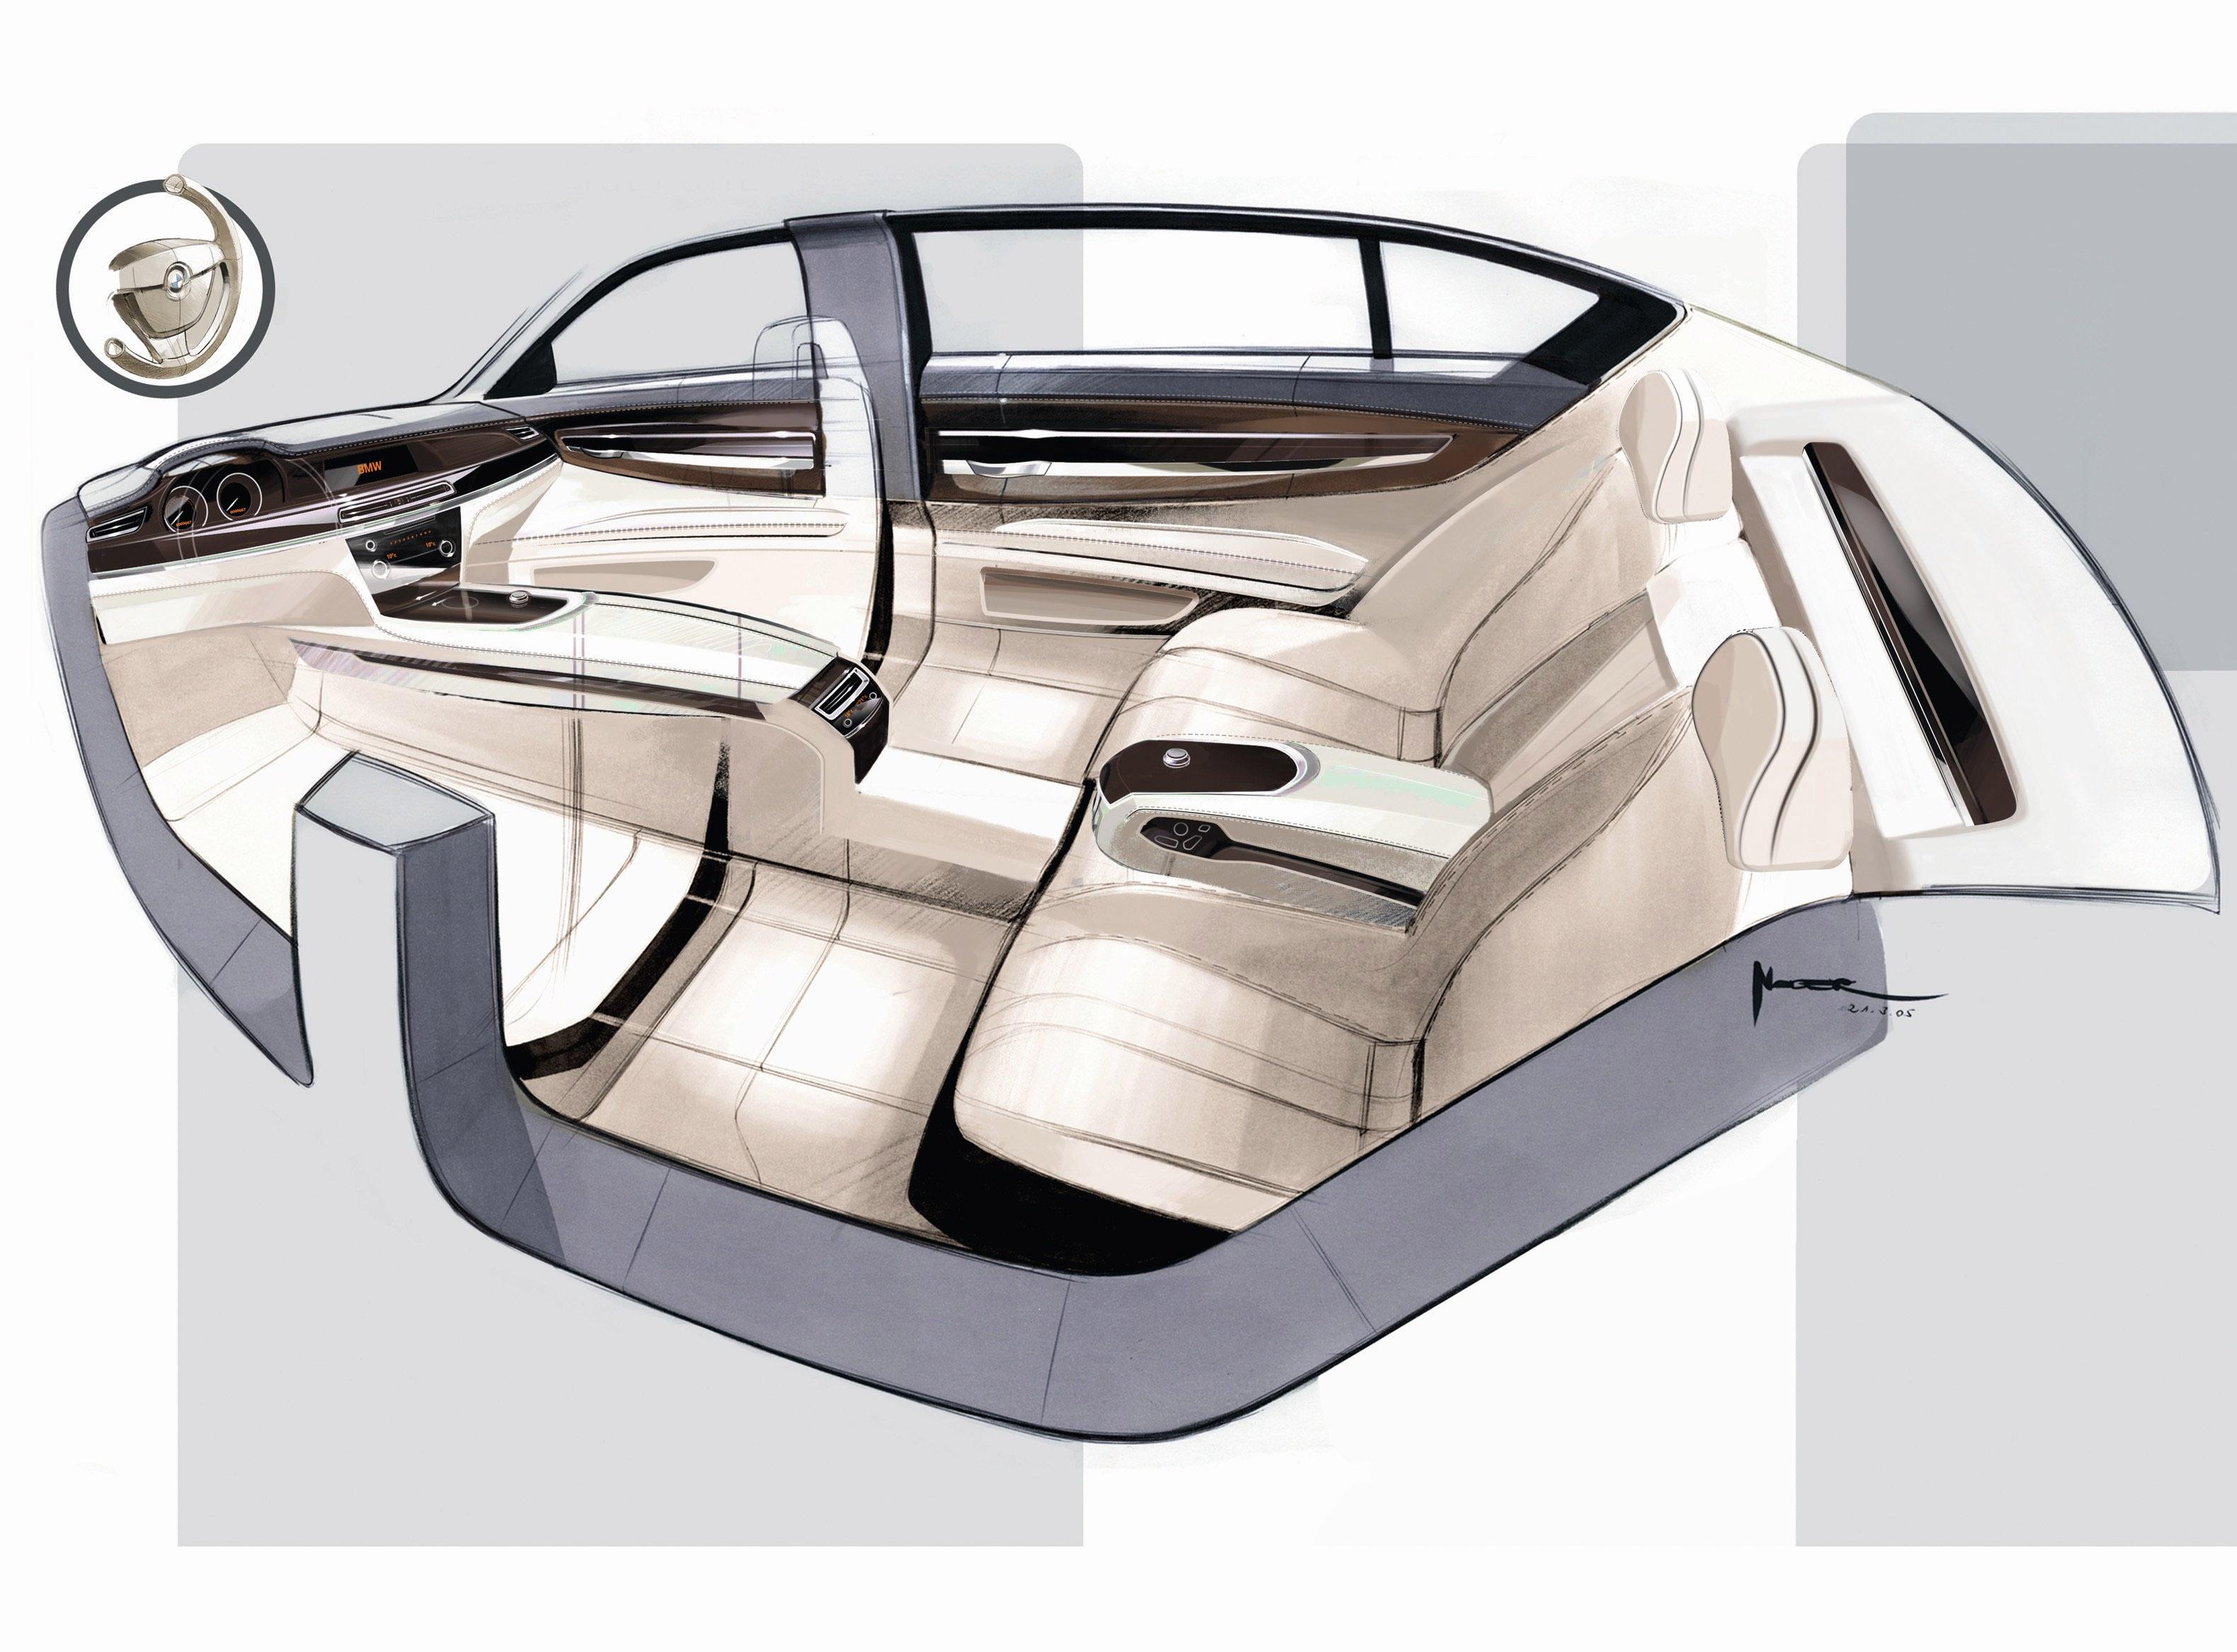 bmw 7 series picture 9104. Black Bedroom Furniture Sets. Home Design Ideas